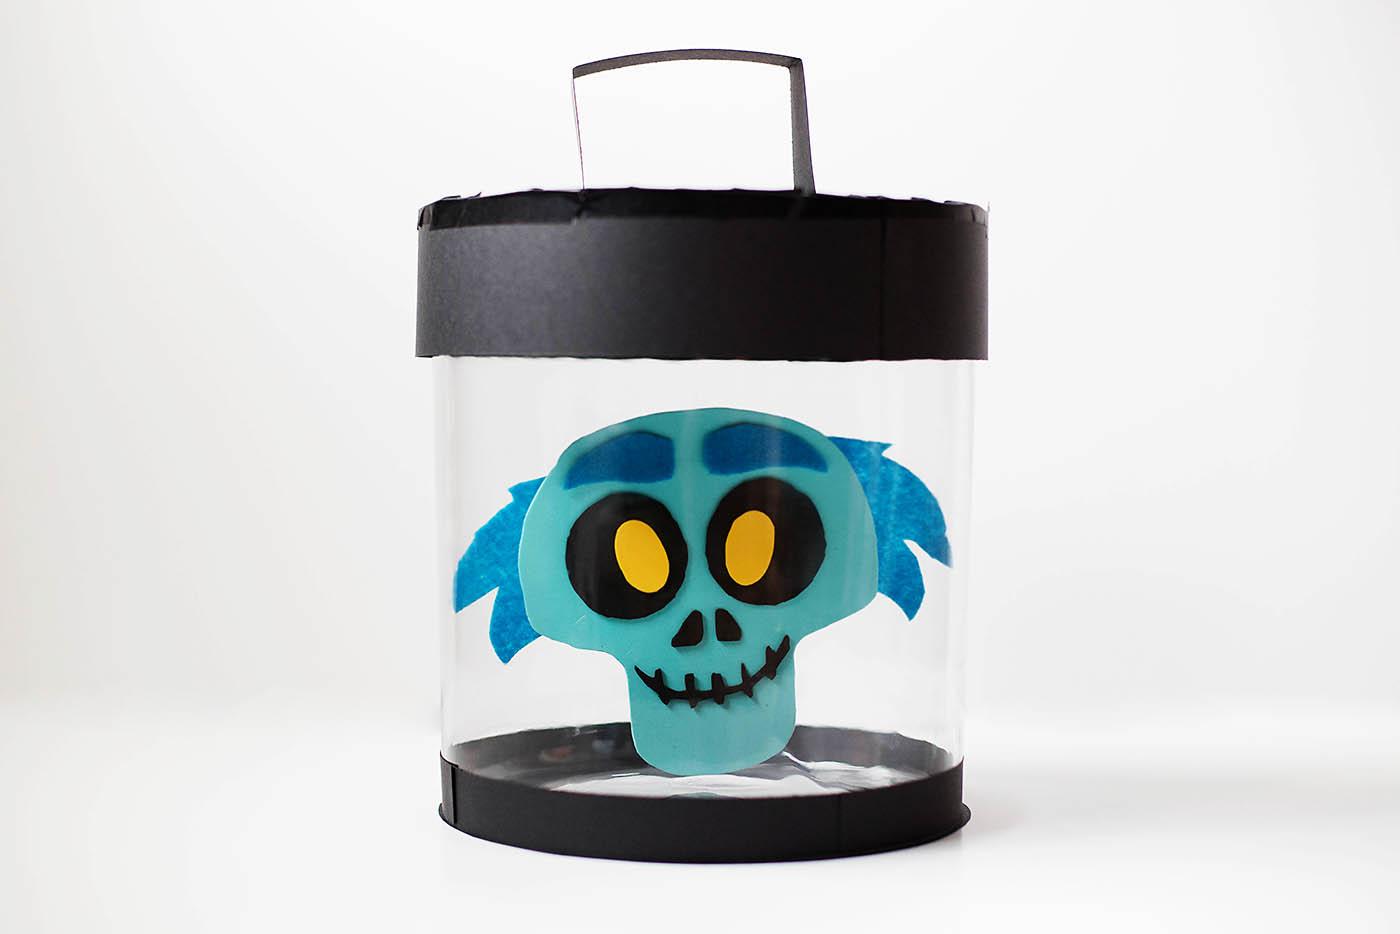 DIY emoji Hatbox Ghost from the Haunted Mansion or Disney Emoji Blitz - a fun Halloween decoration for Disney lovers!